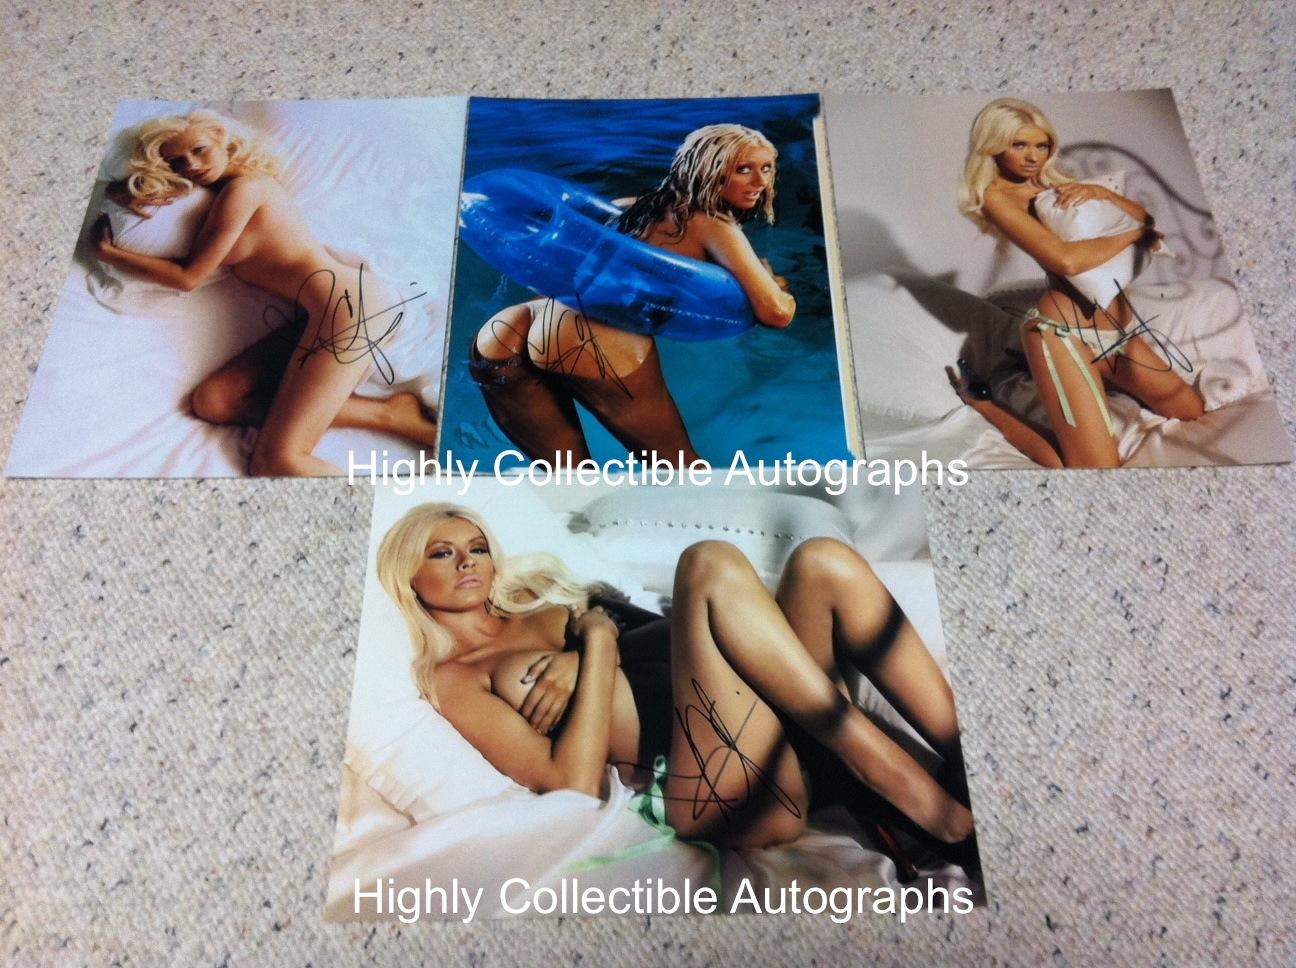 http://3.bp.blogspot.com/-70uu0wdrcxg/UGZhRai3lfI/AAAAAAAAGS0/rGd-sOxJYKI/s1600/Christina+Aguilera+autographs.jpg